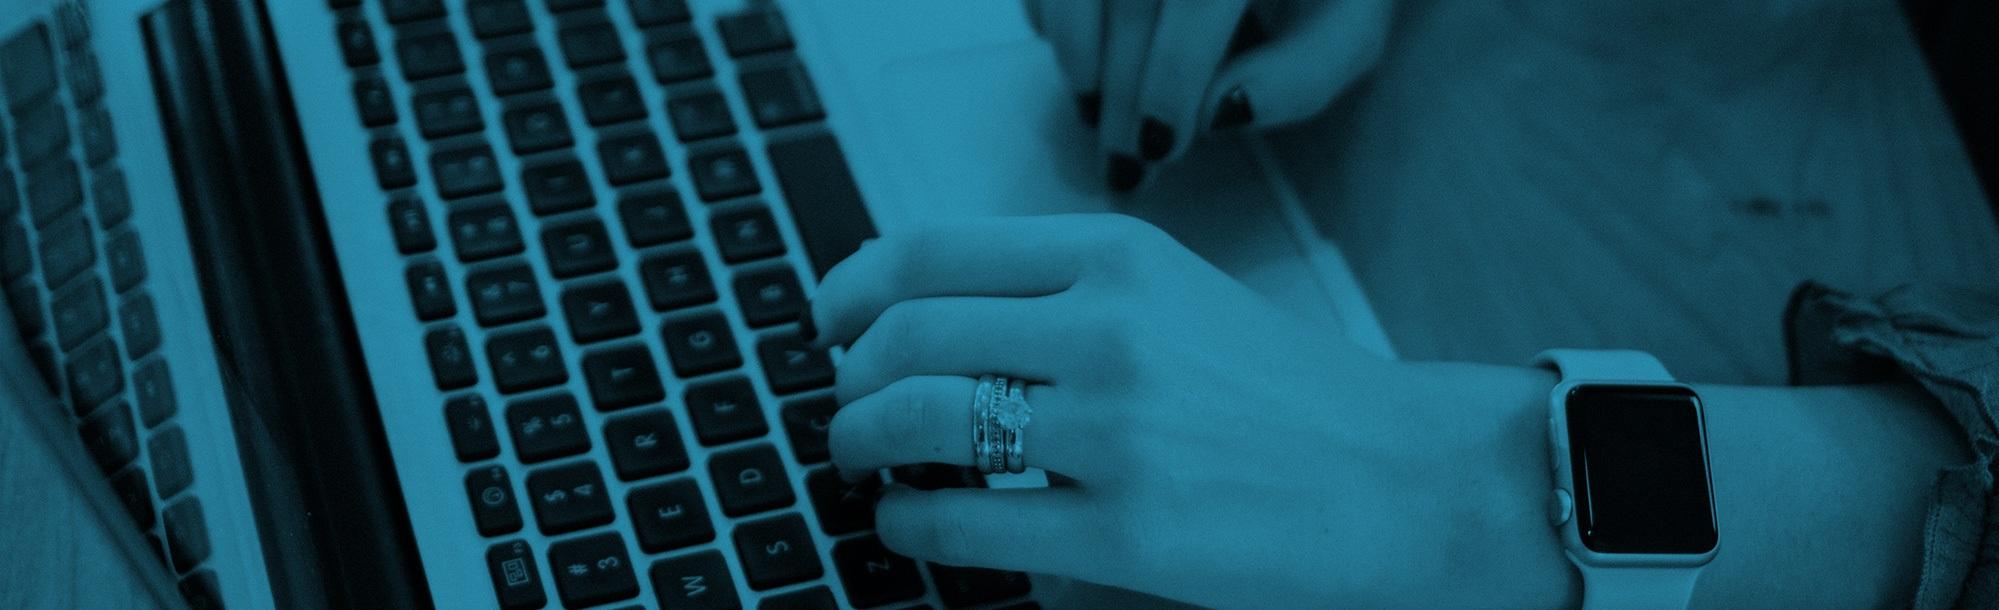 WEBINARS - Sub headline promoting webinars goes here